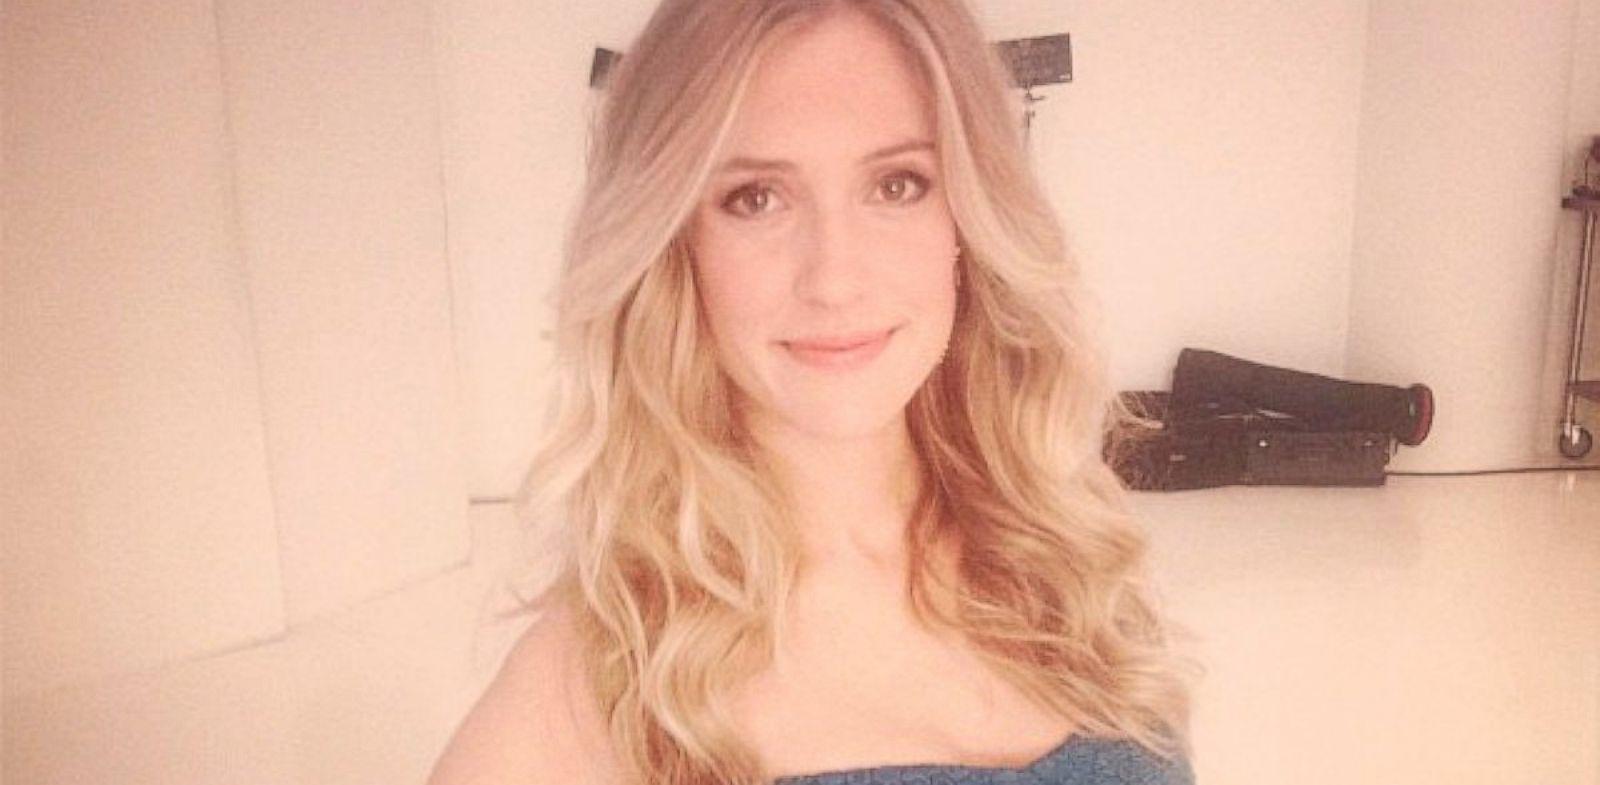 PHOTO: Kristin Cavallari shared this image of herself on Instagram, Jan. 21, 2014.